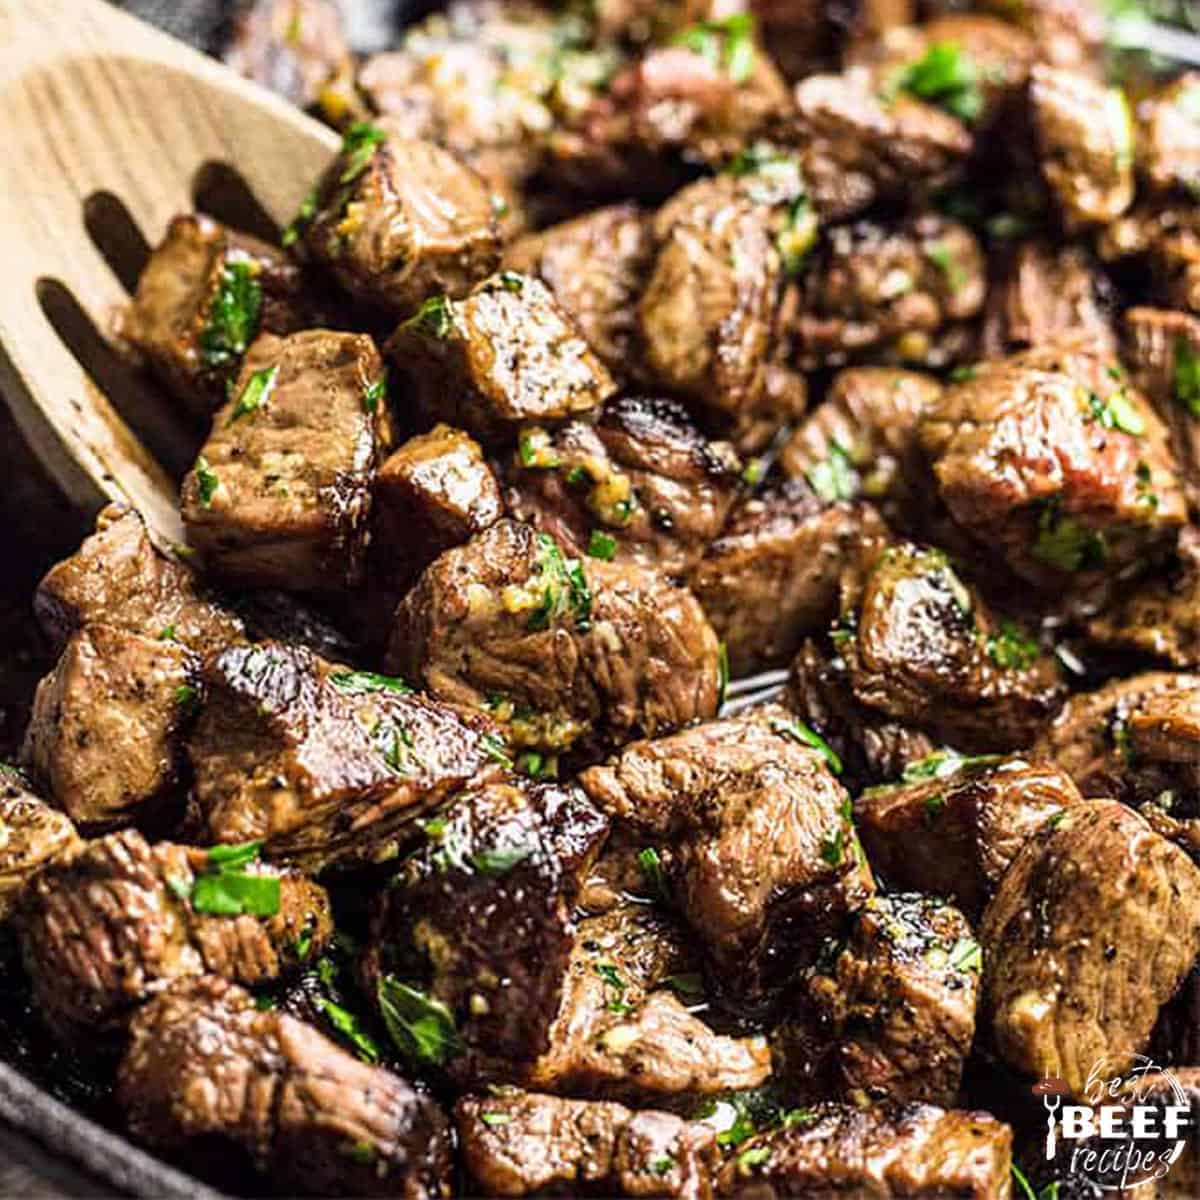 Close up of garlic butter steak bites in the skillet